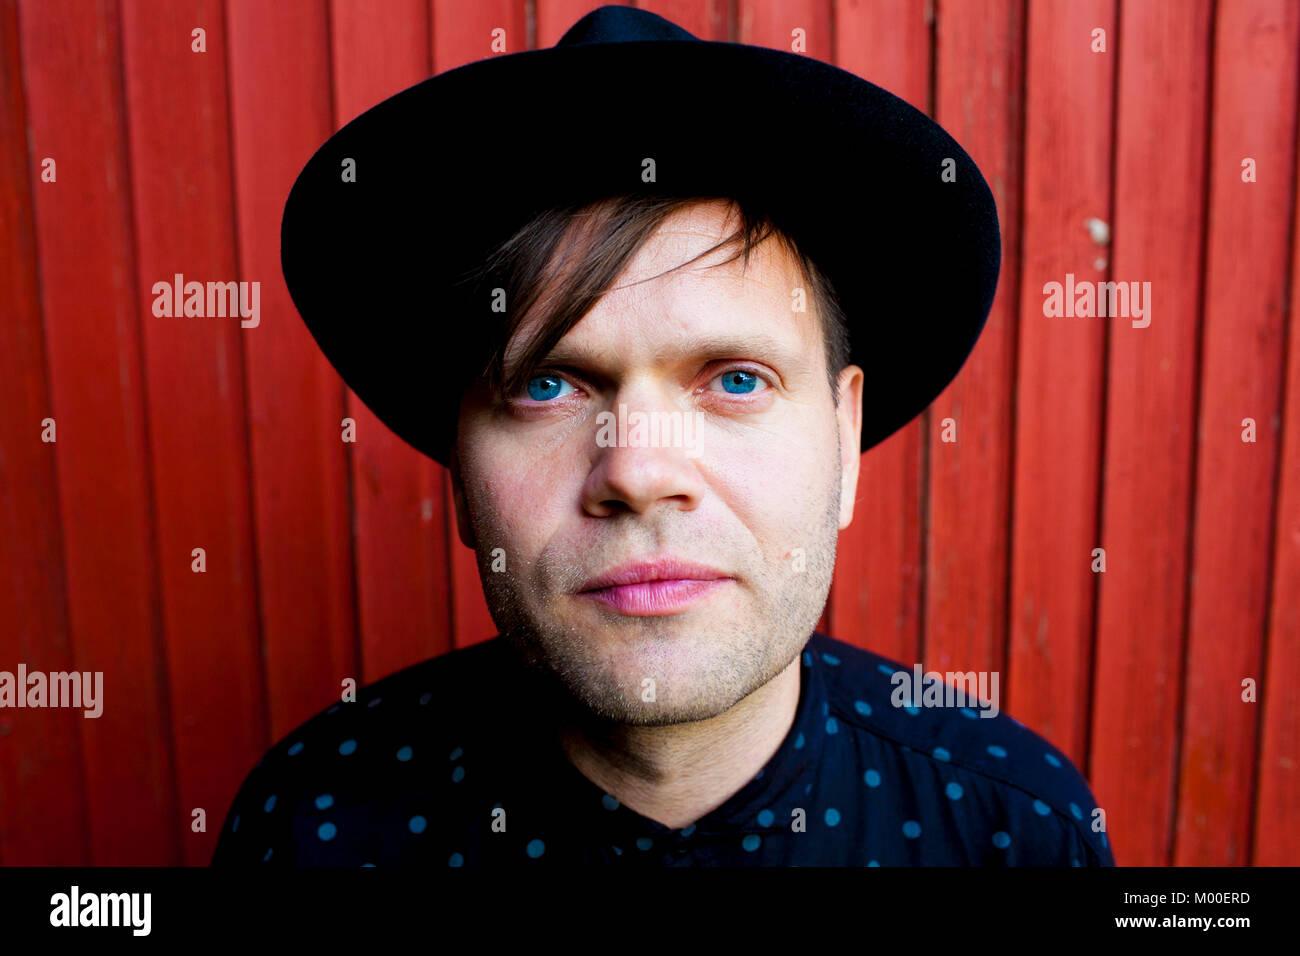 The Danish DJ, producer and hit-maker Anders Trentemøller is